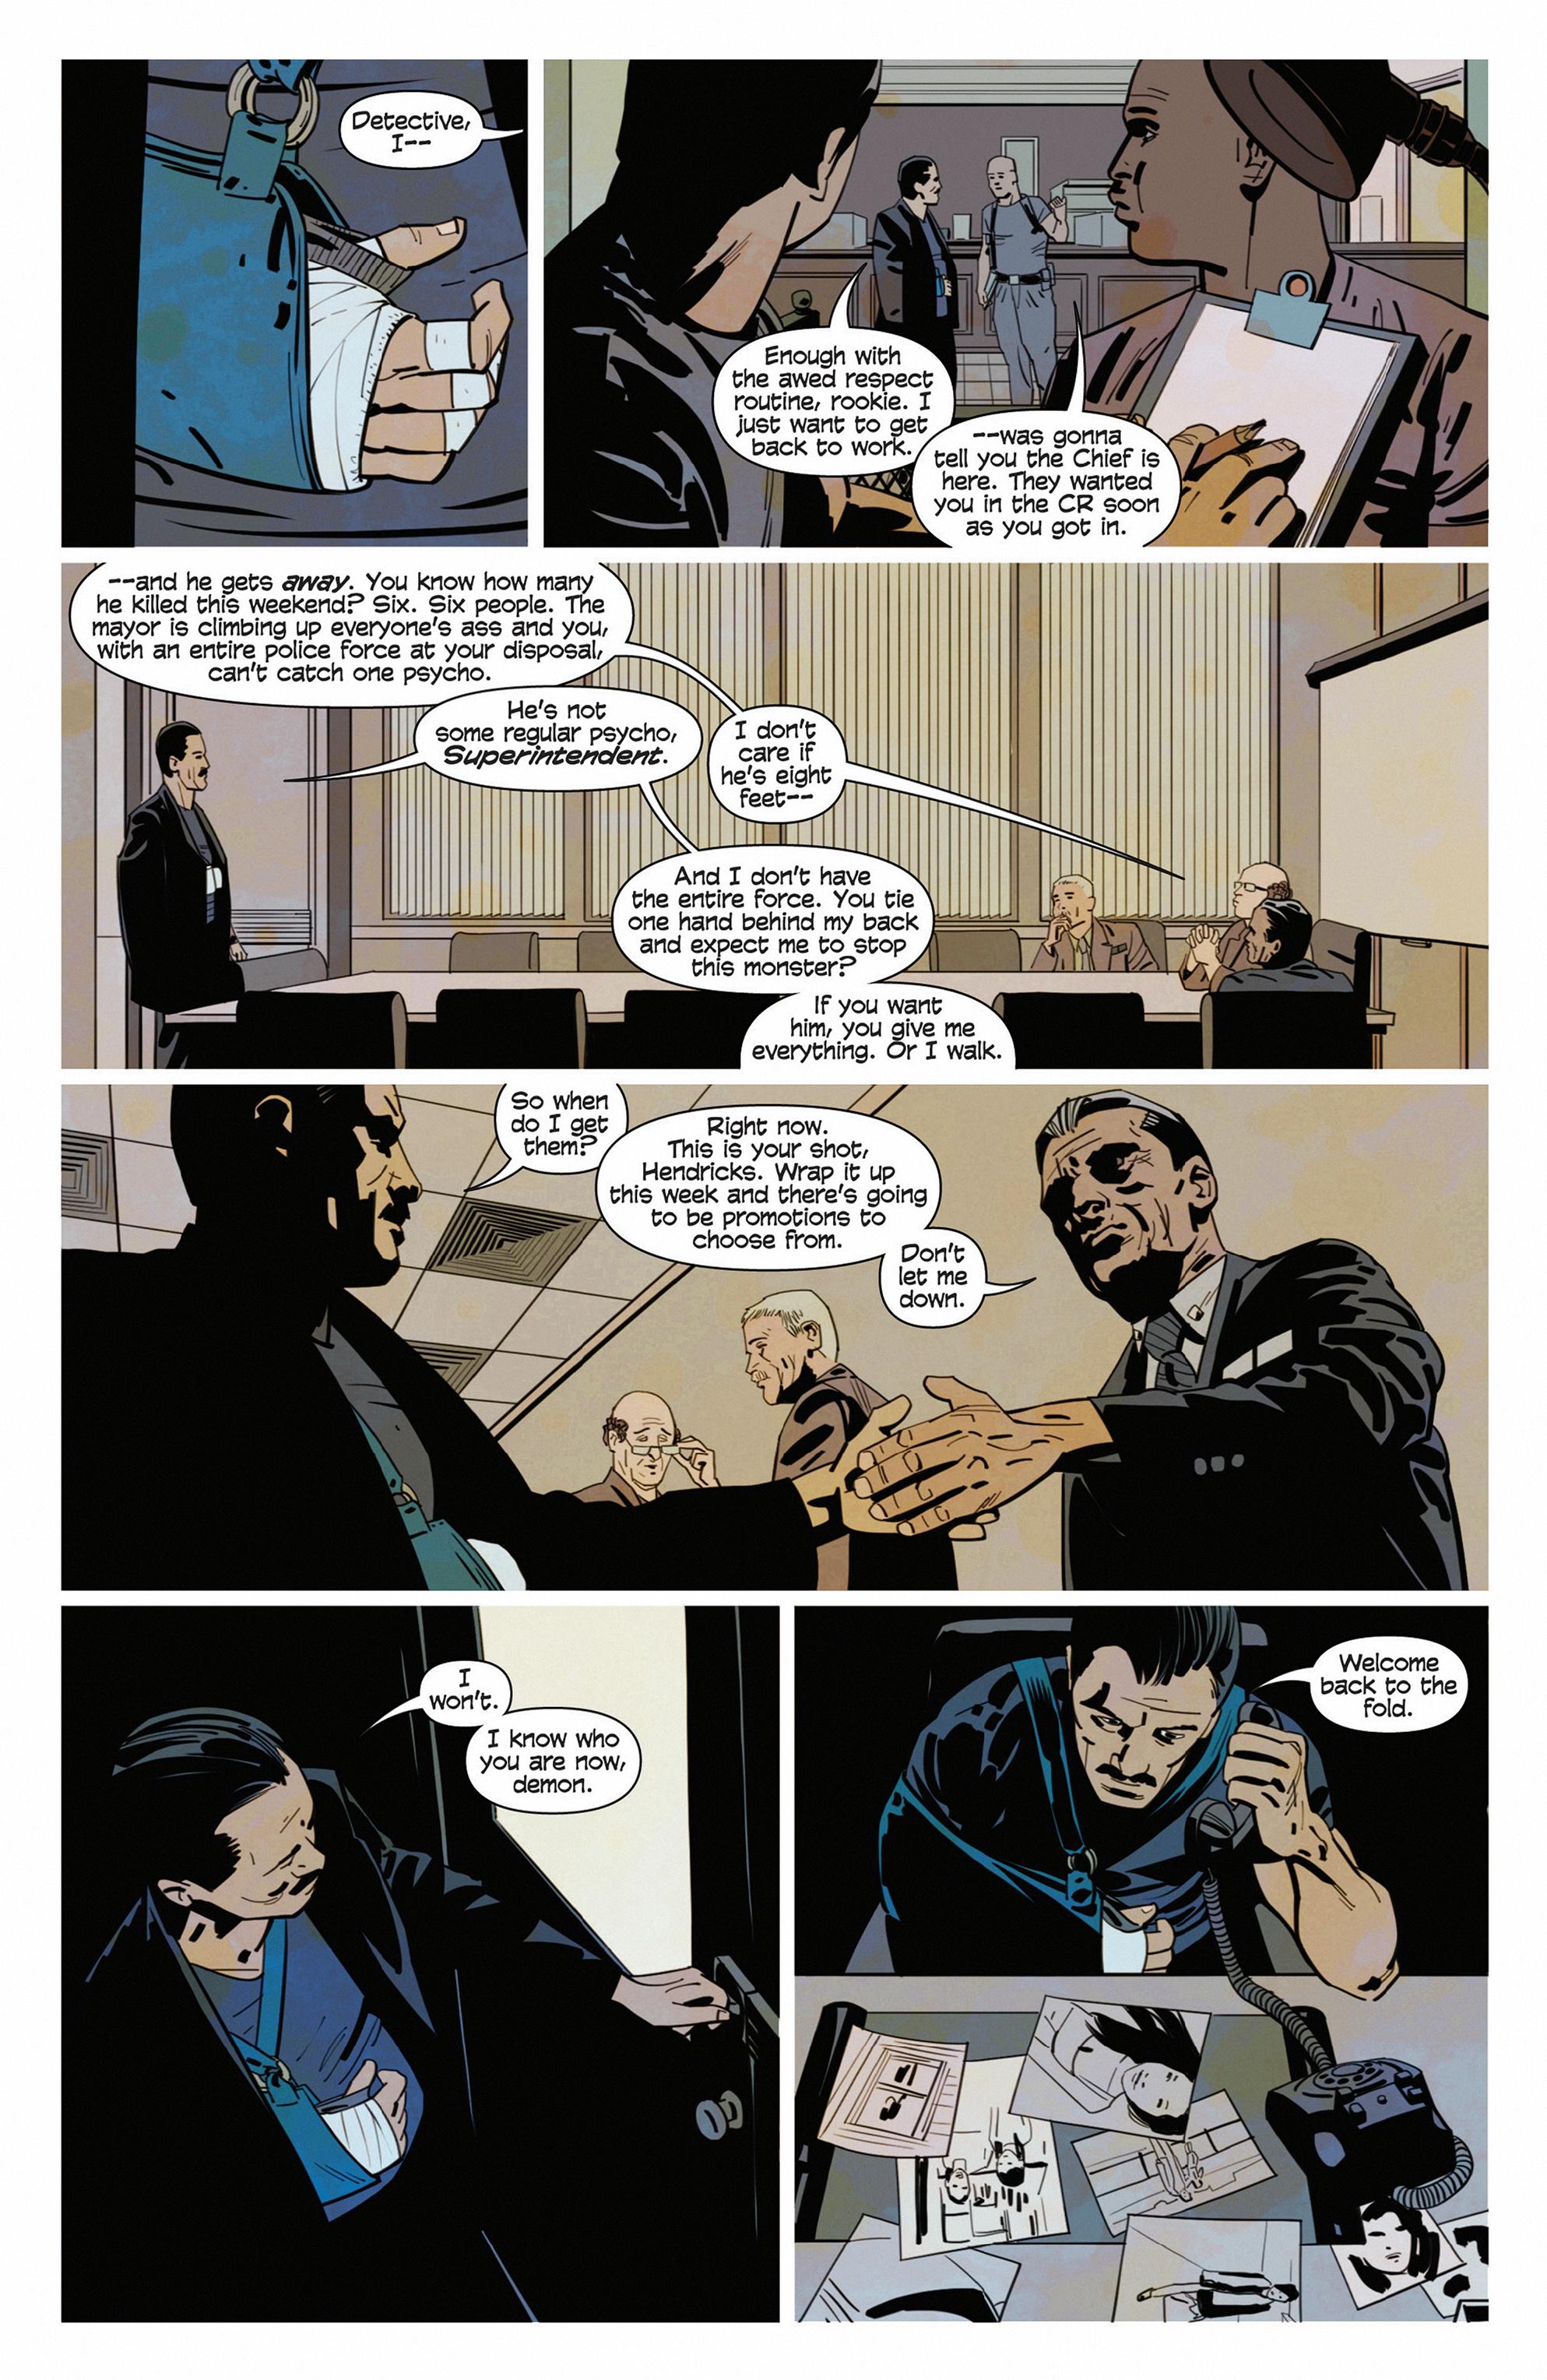 Read online Demonic comic -  Issue #5 - 12